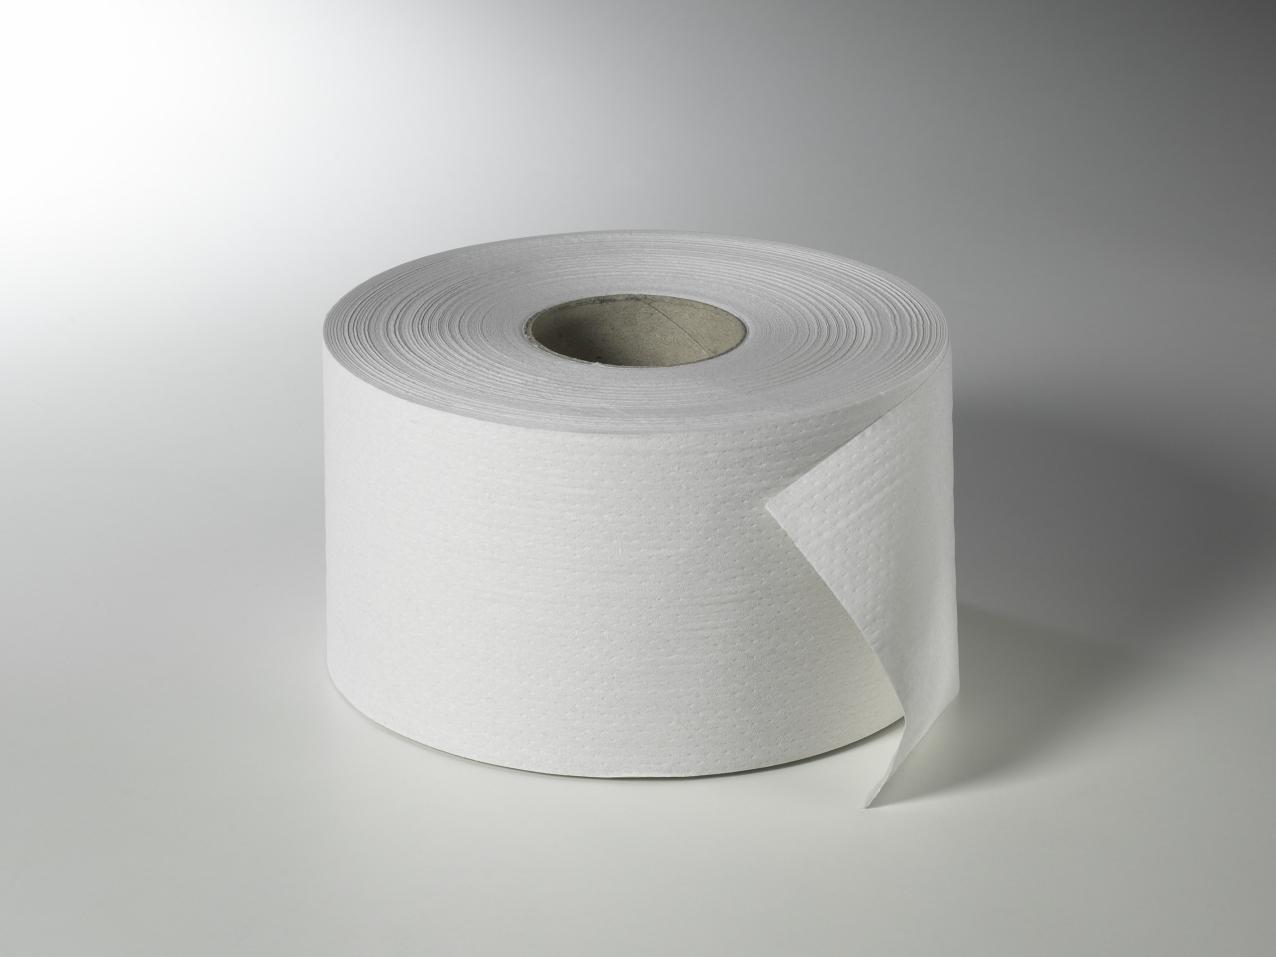 Fripa - Toilettenpapier maxi, 2-lagig, 180 m, nicht perforiert (12 Rl.)